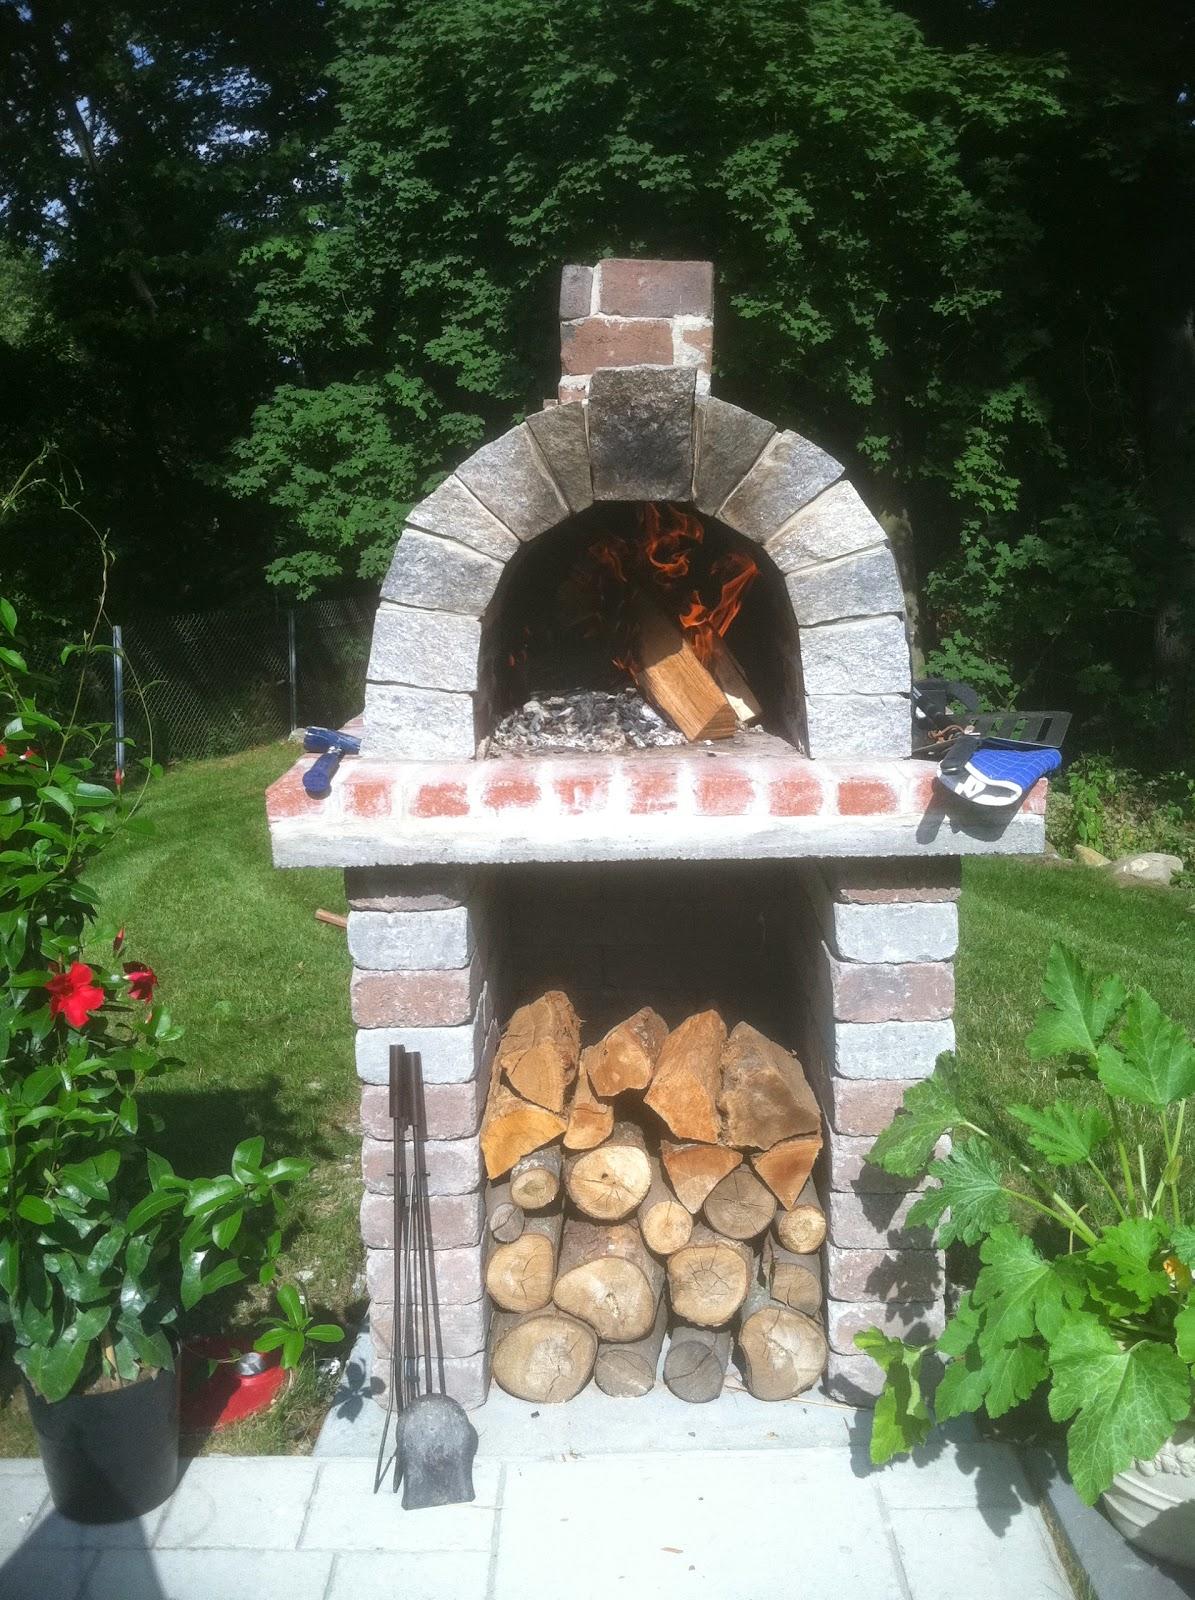 the schelzi family wood fired brick pizza oven in massachusetts